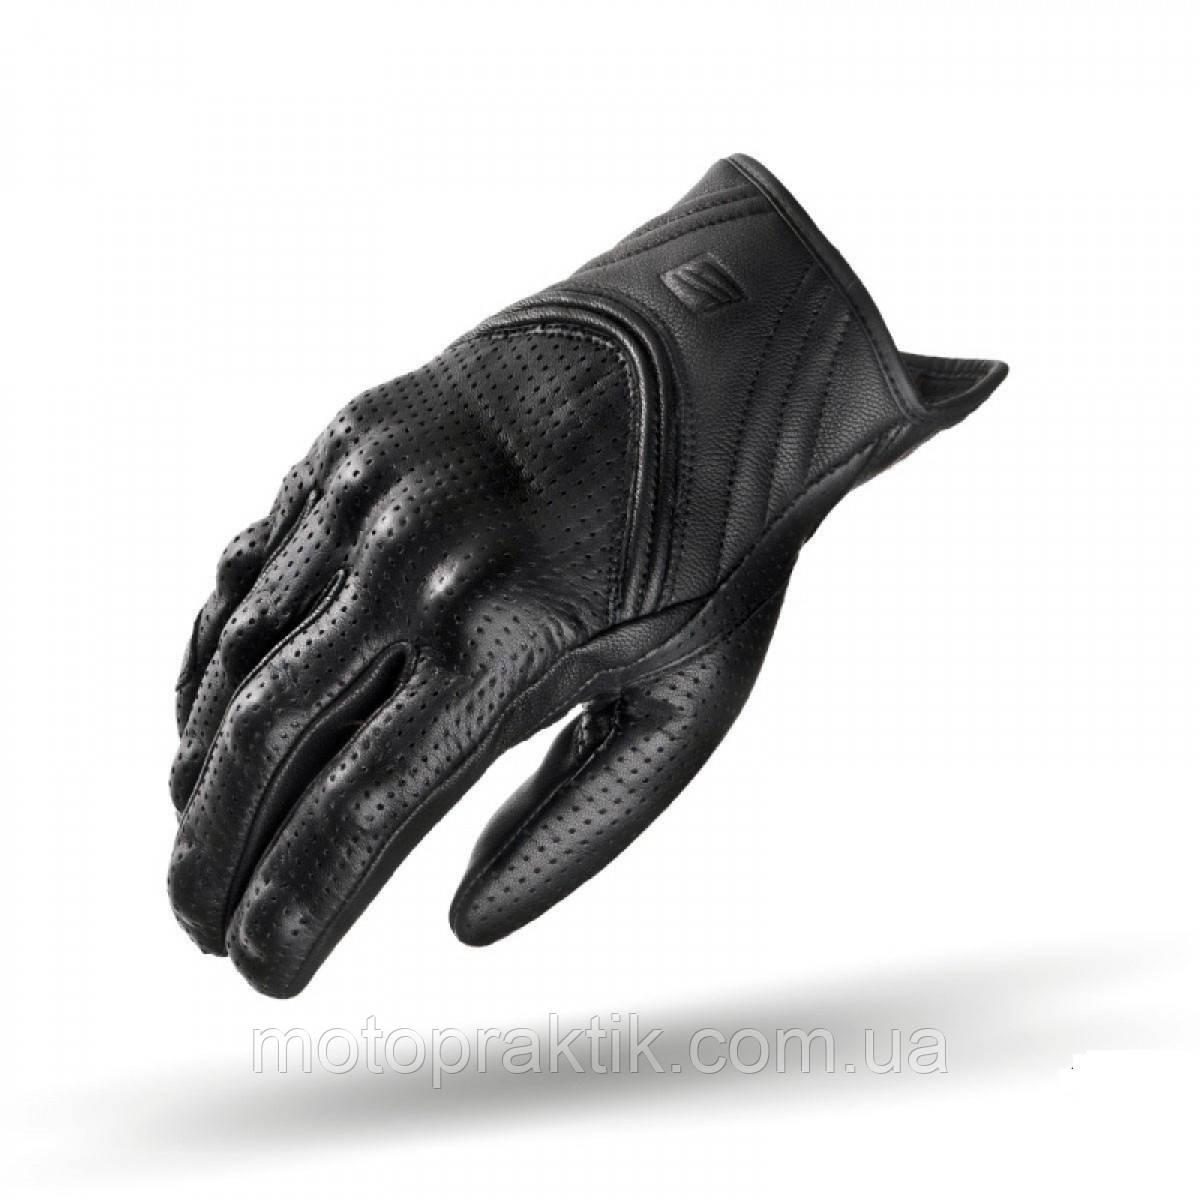 SHIMA BULLET LADY Gloves, Black, XS, Мотоперчатки